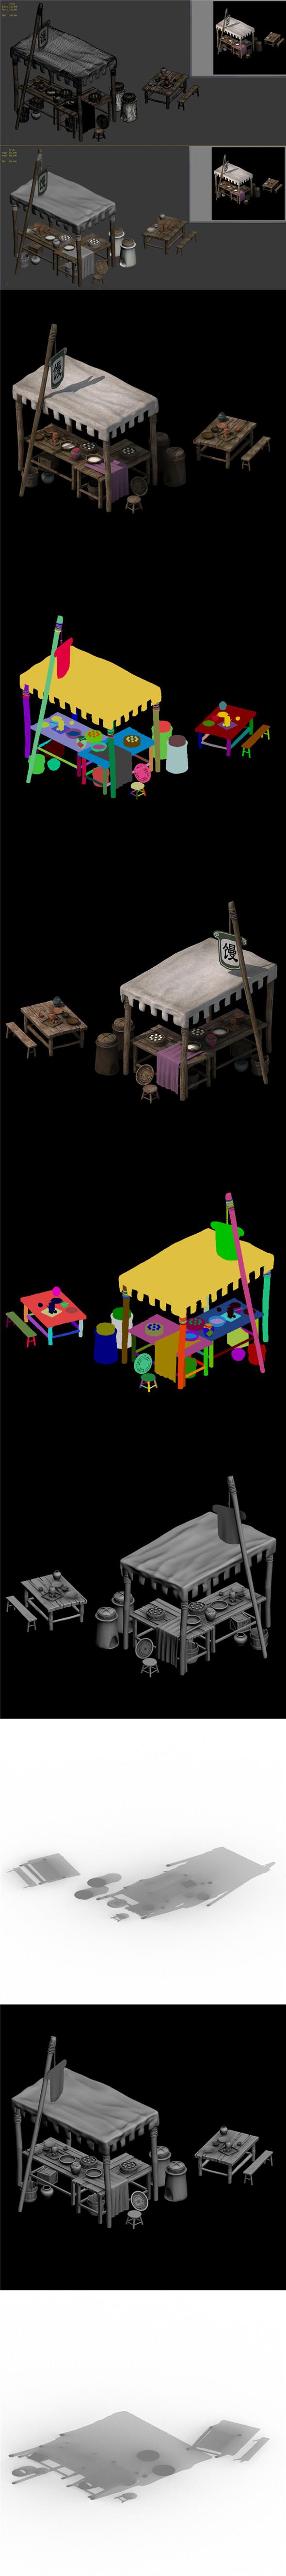 Small town shops - buns shop - 3DOcean Item for Sale